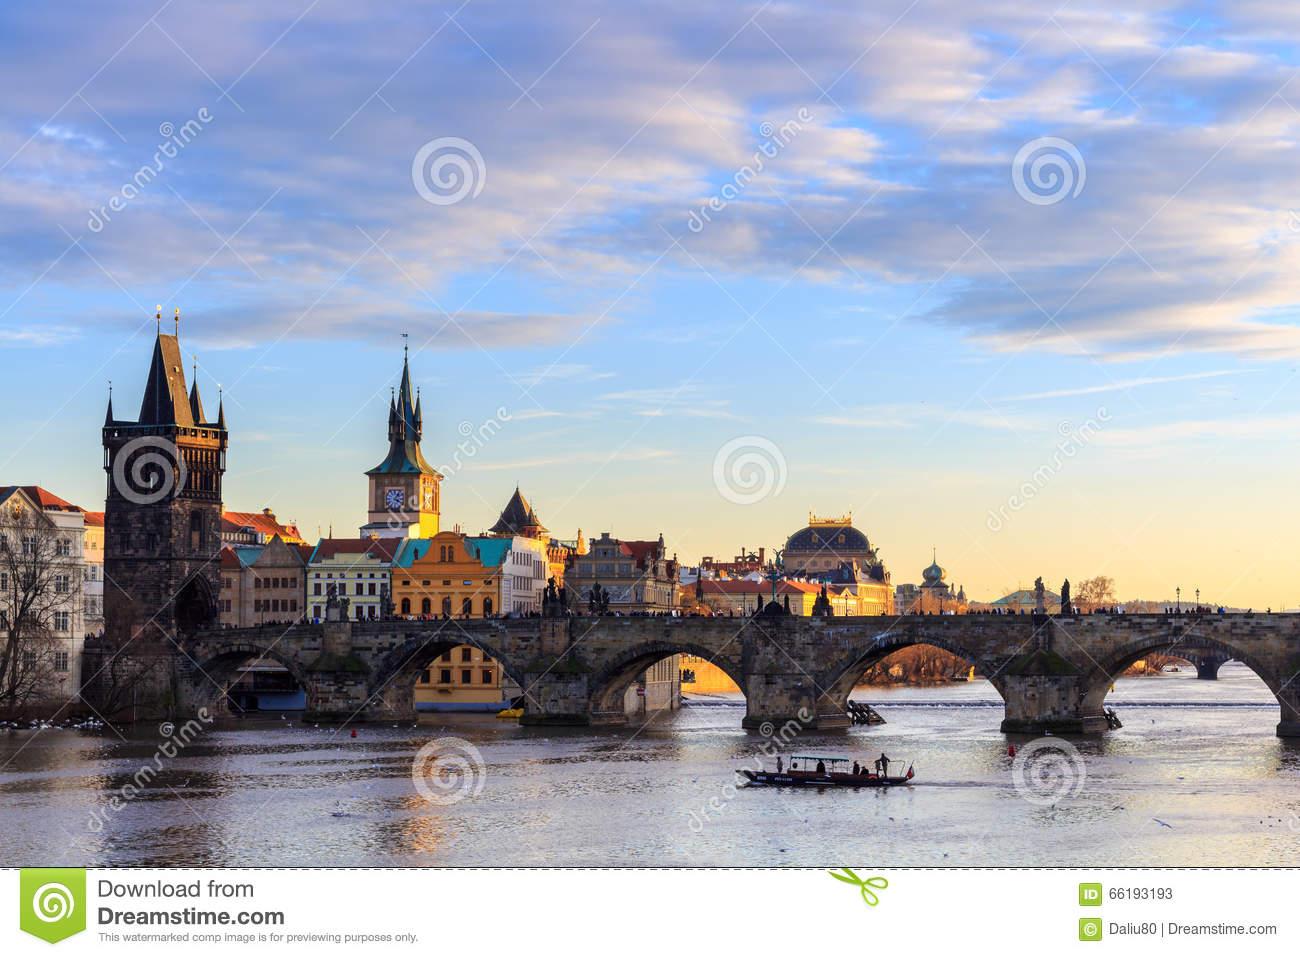 Charles Bridge, Moldau River, Lesser Town, Prague Castle, Prague.